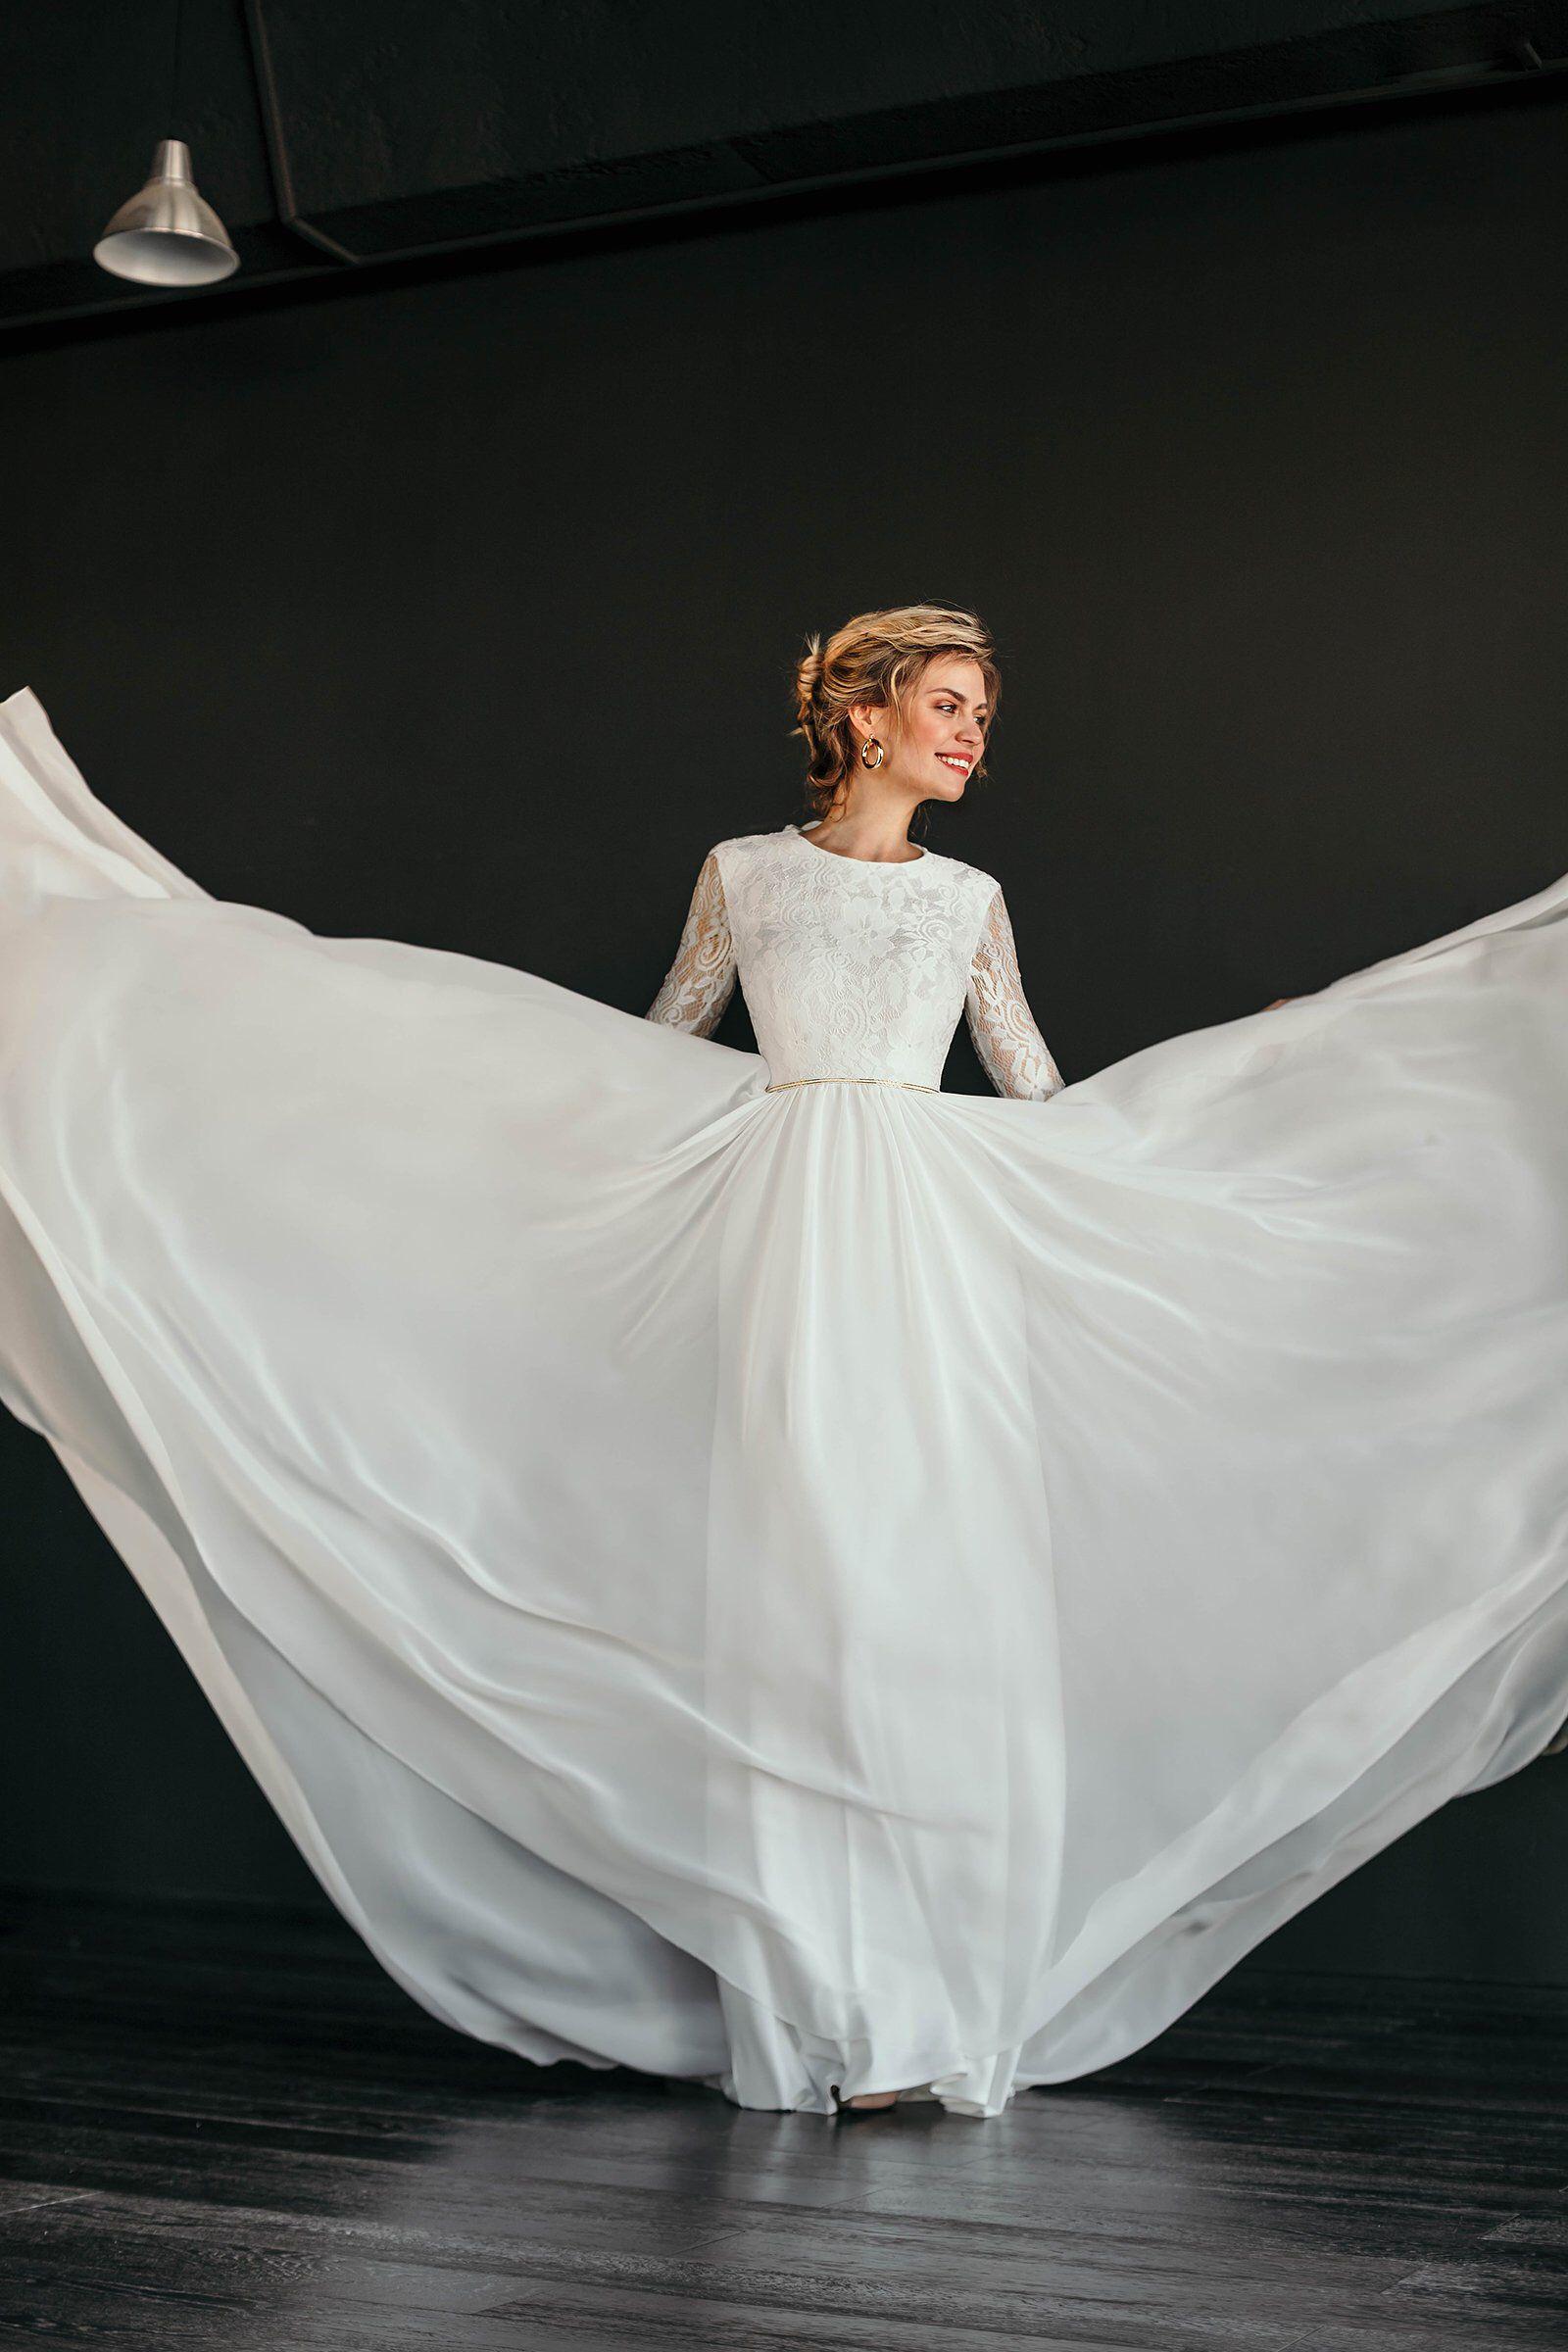 Flowy wedding dress with sleeves  Romantic wedding dress